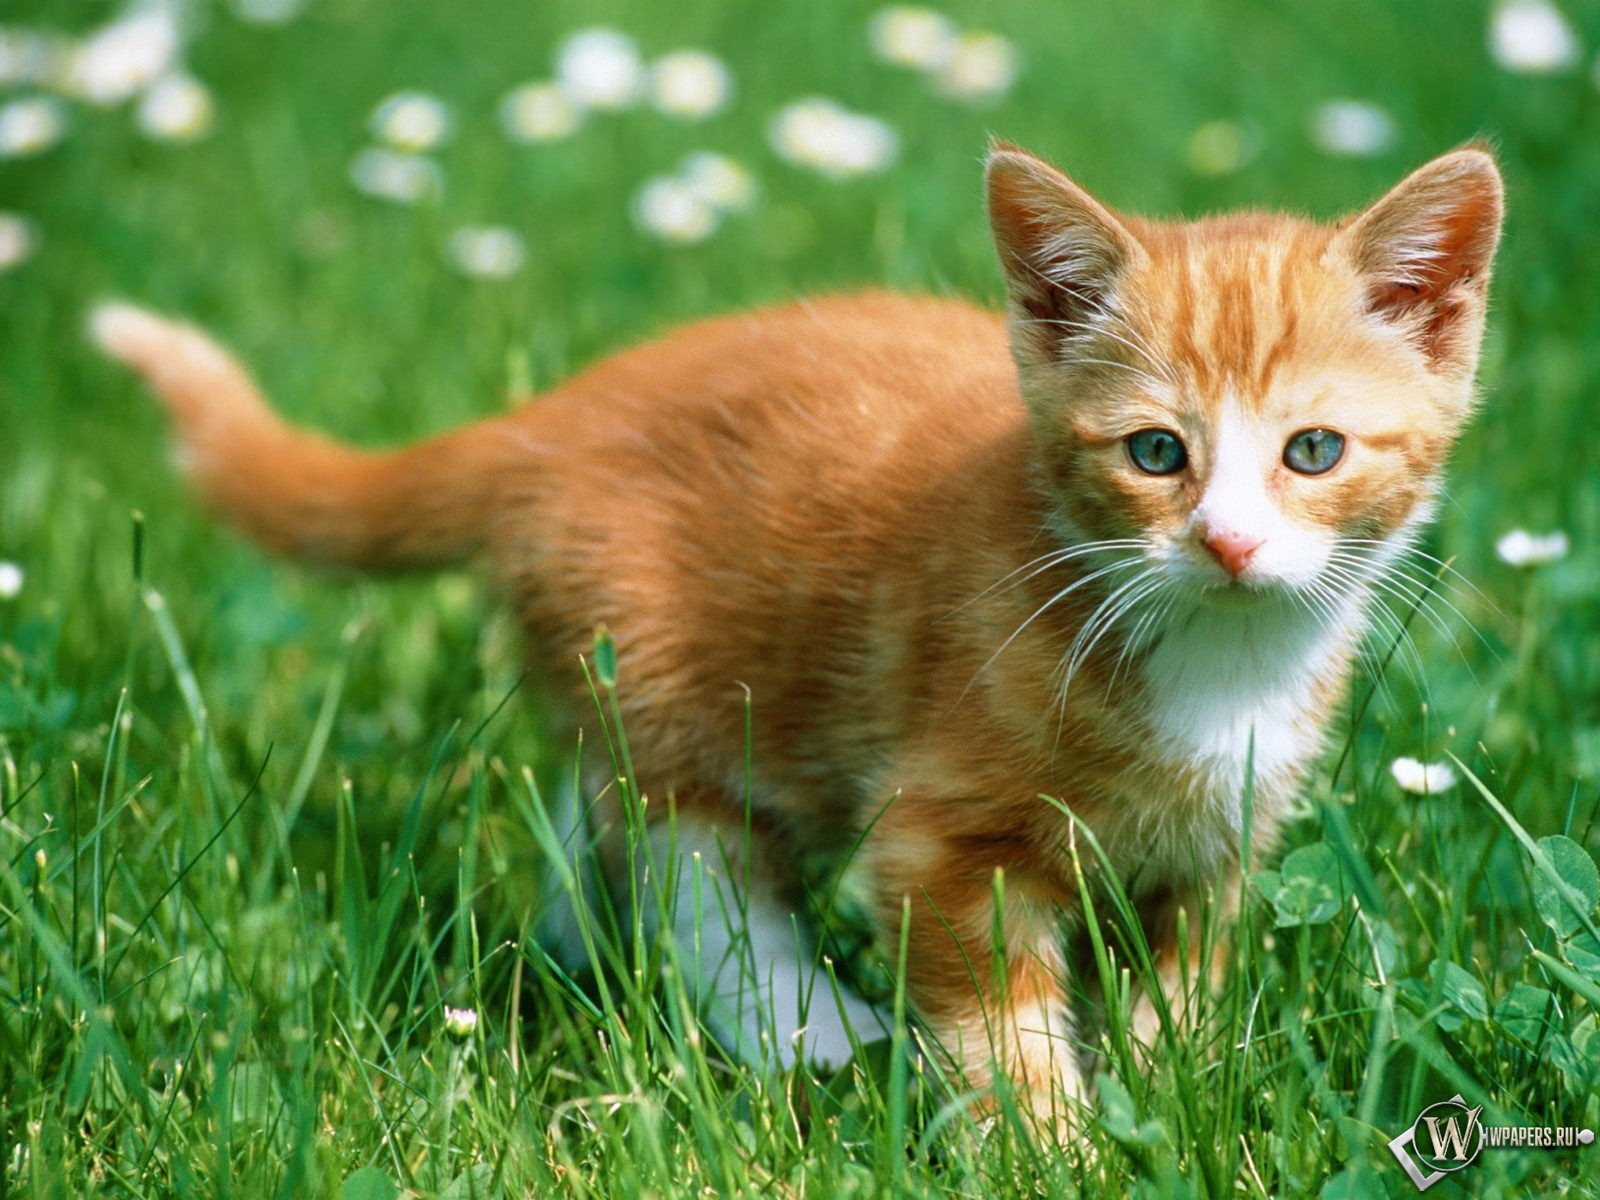 Рыжий котенок в траве 1600x1200